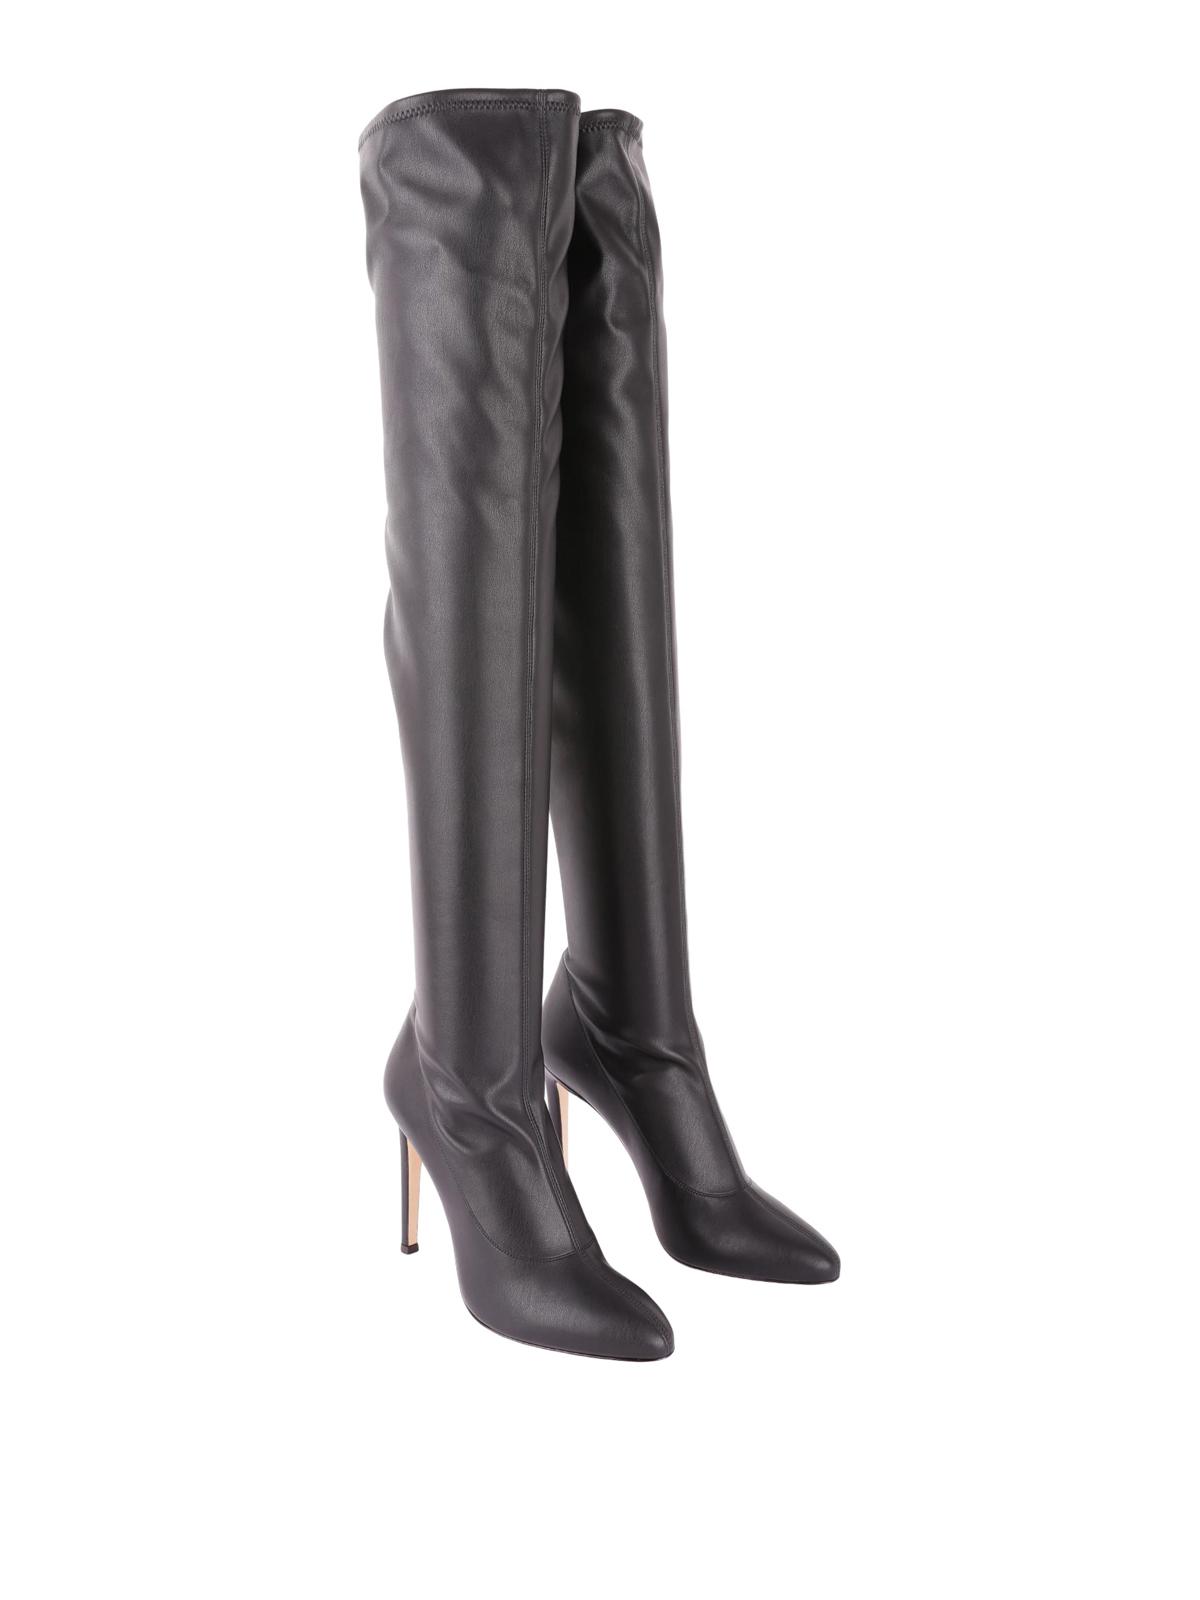 Giuseppe Zanotti - Dena stretch leather